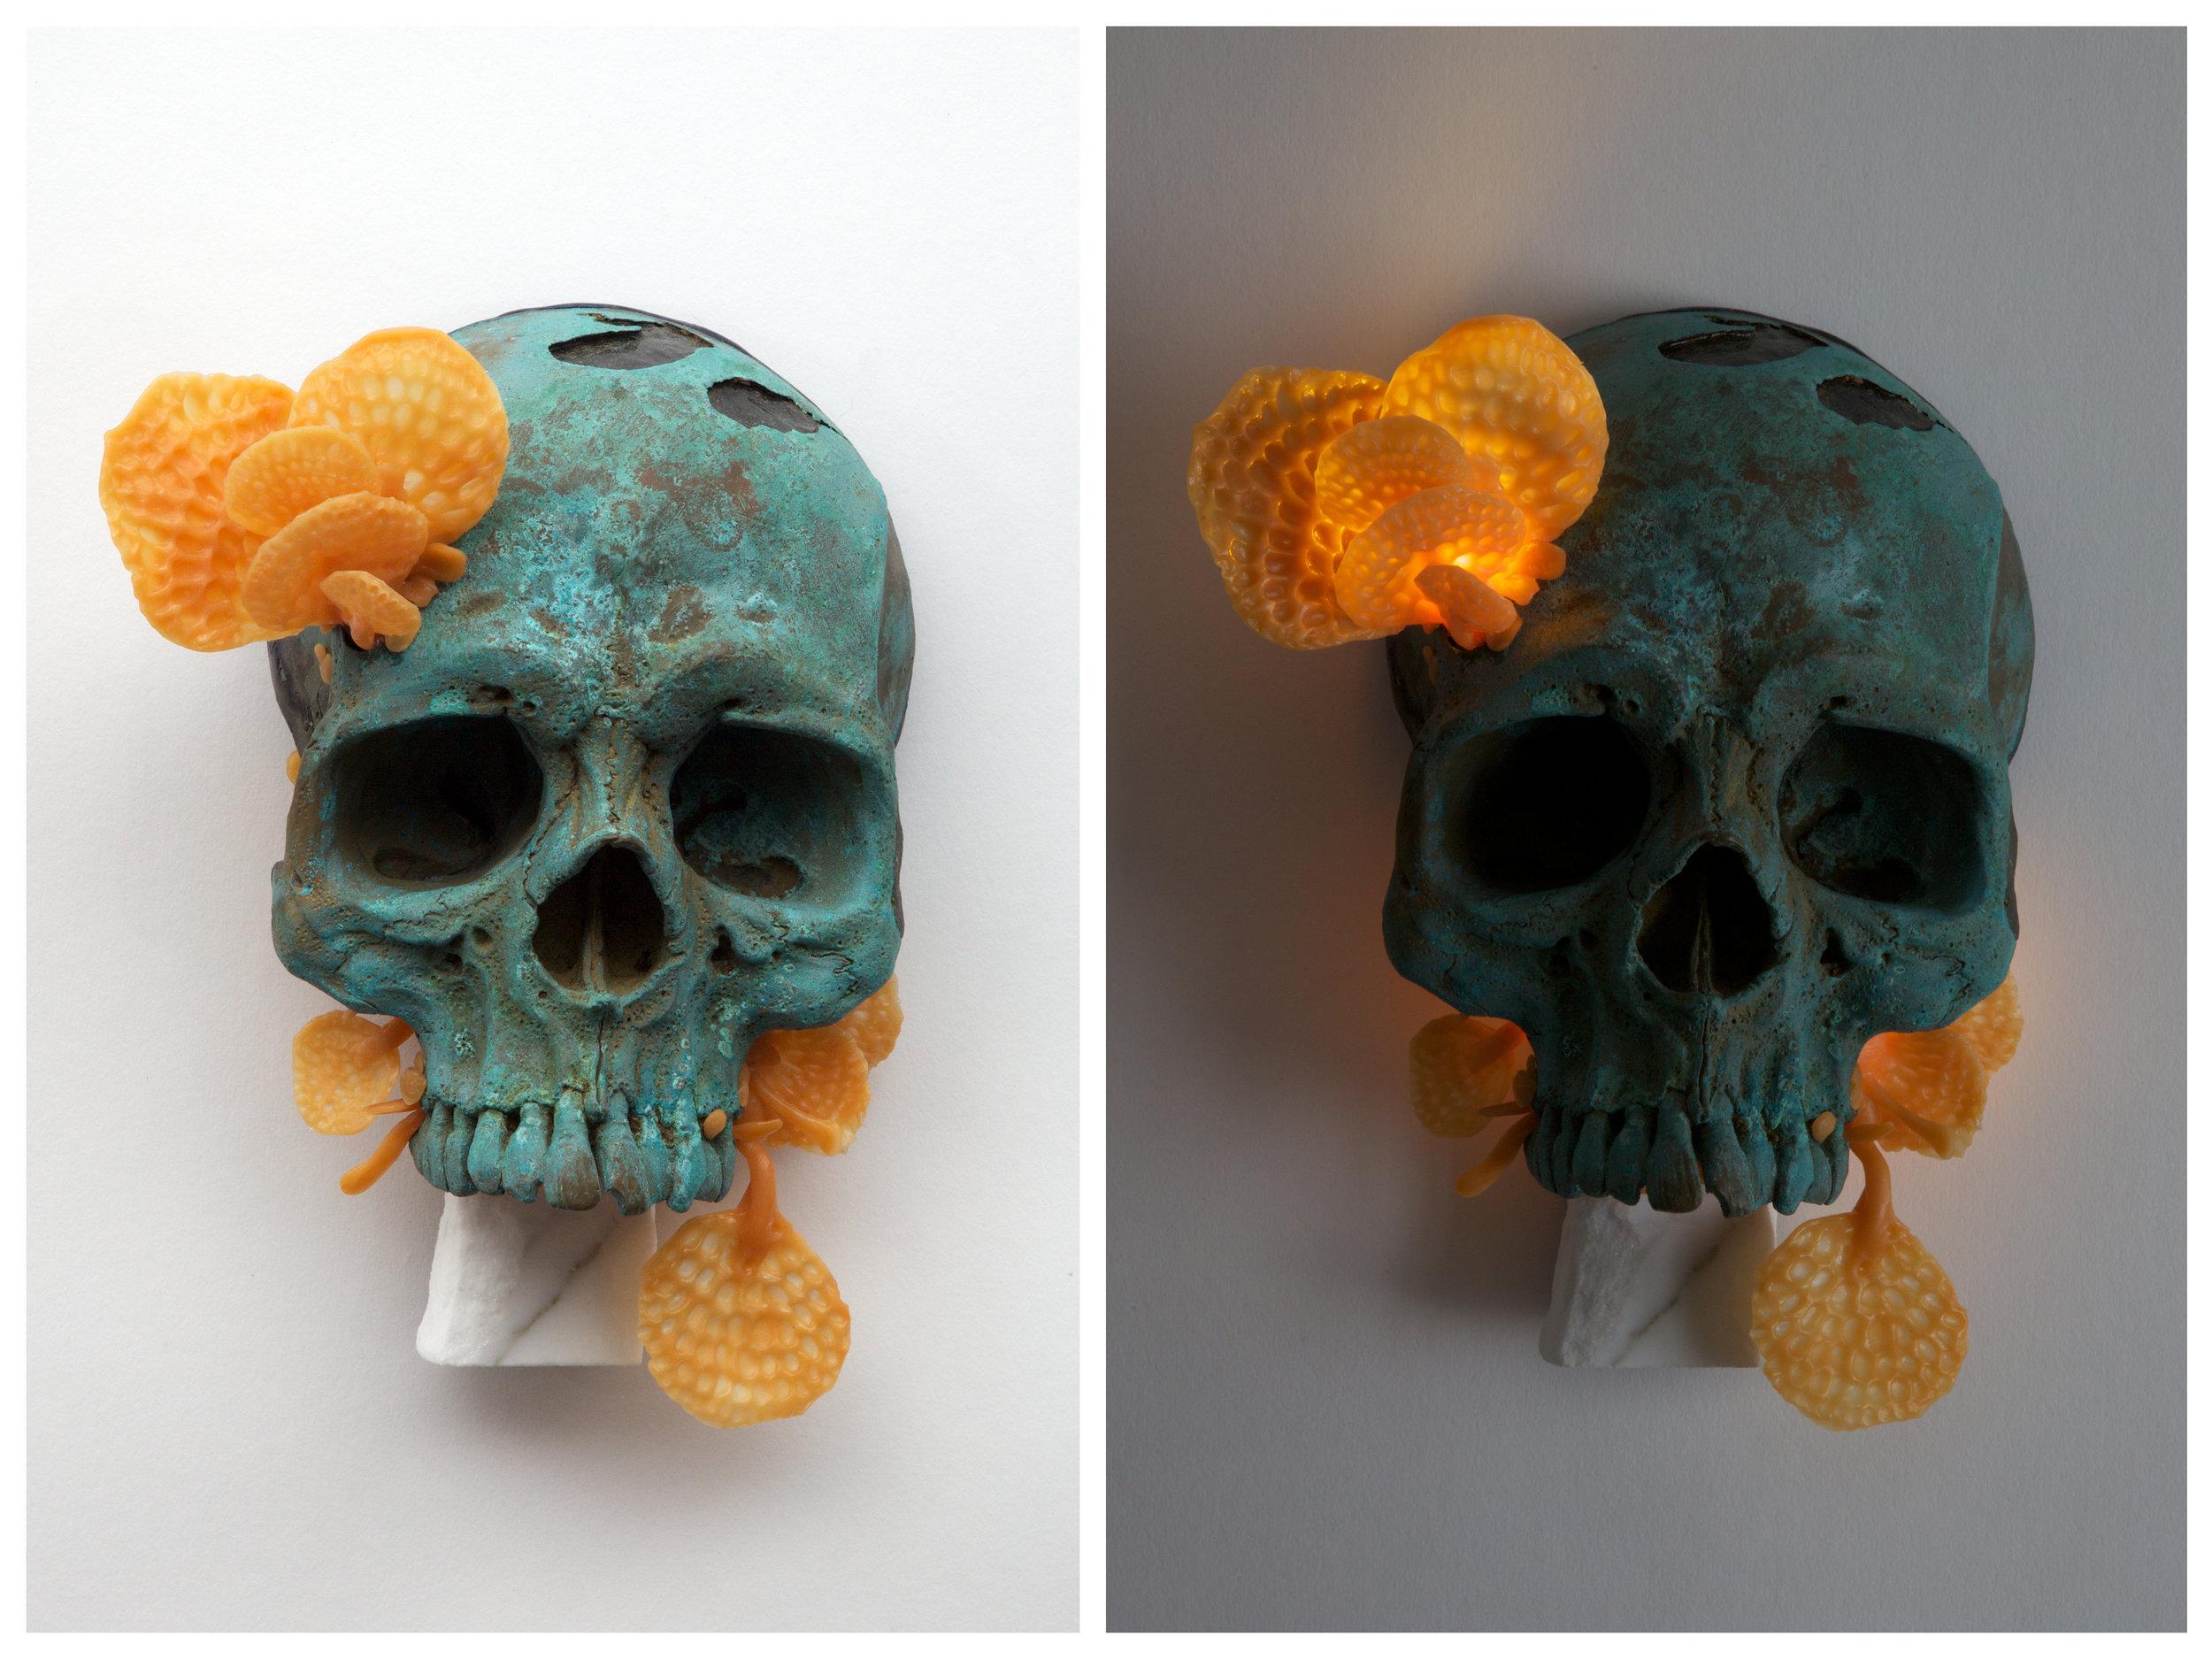 Favolaschia calocera. 2016-cold cast brass, plastic, carara marble, LED lights